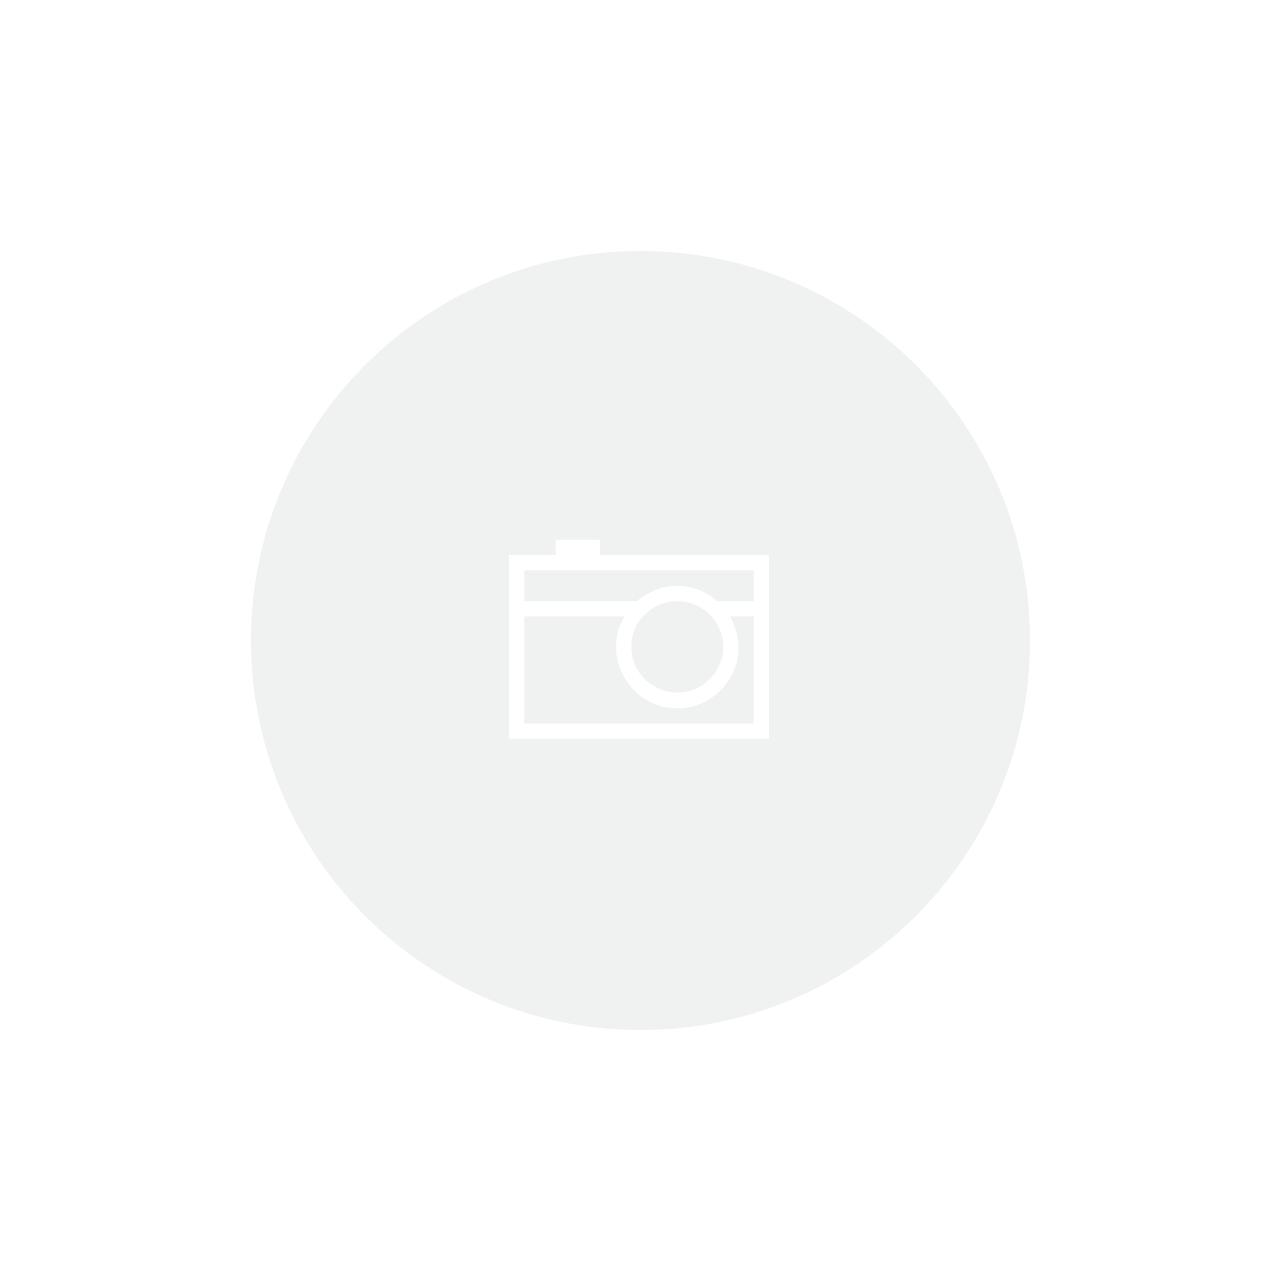 GUIA DE CORRENTE SHIMANO SAINT SM-CD50 ISCG 05 COM GUARD 36D